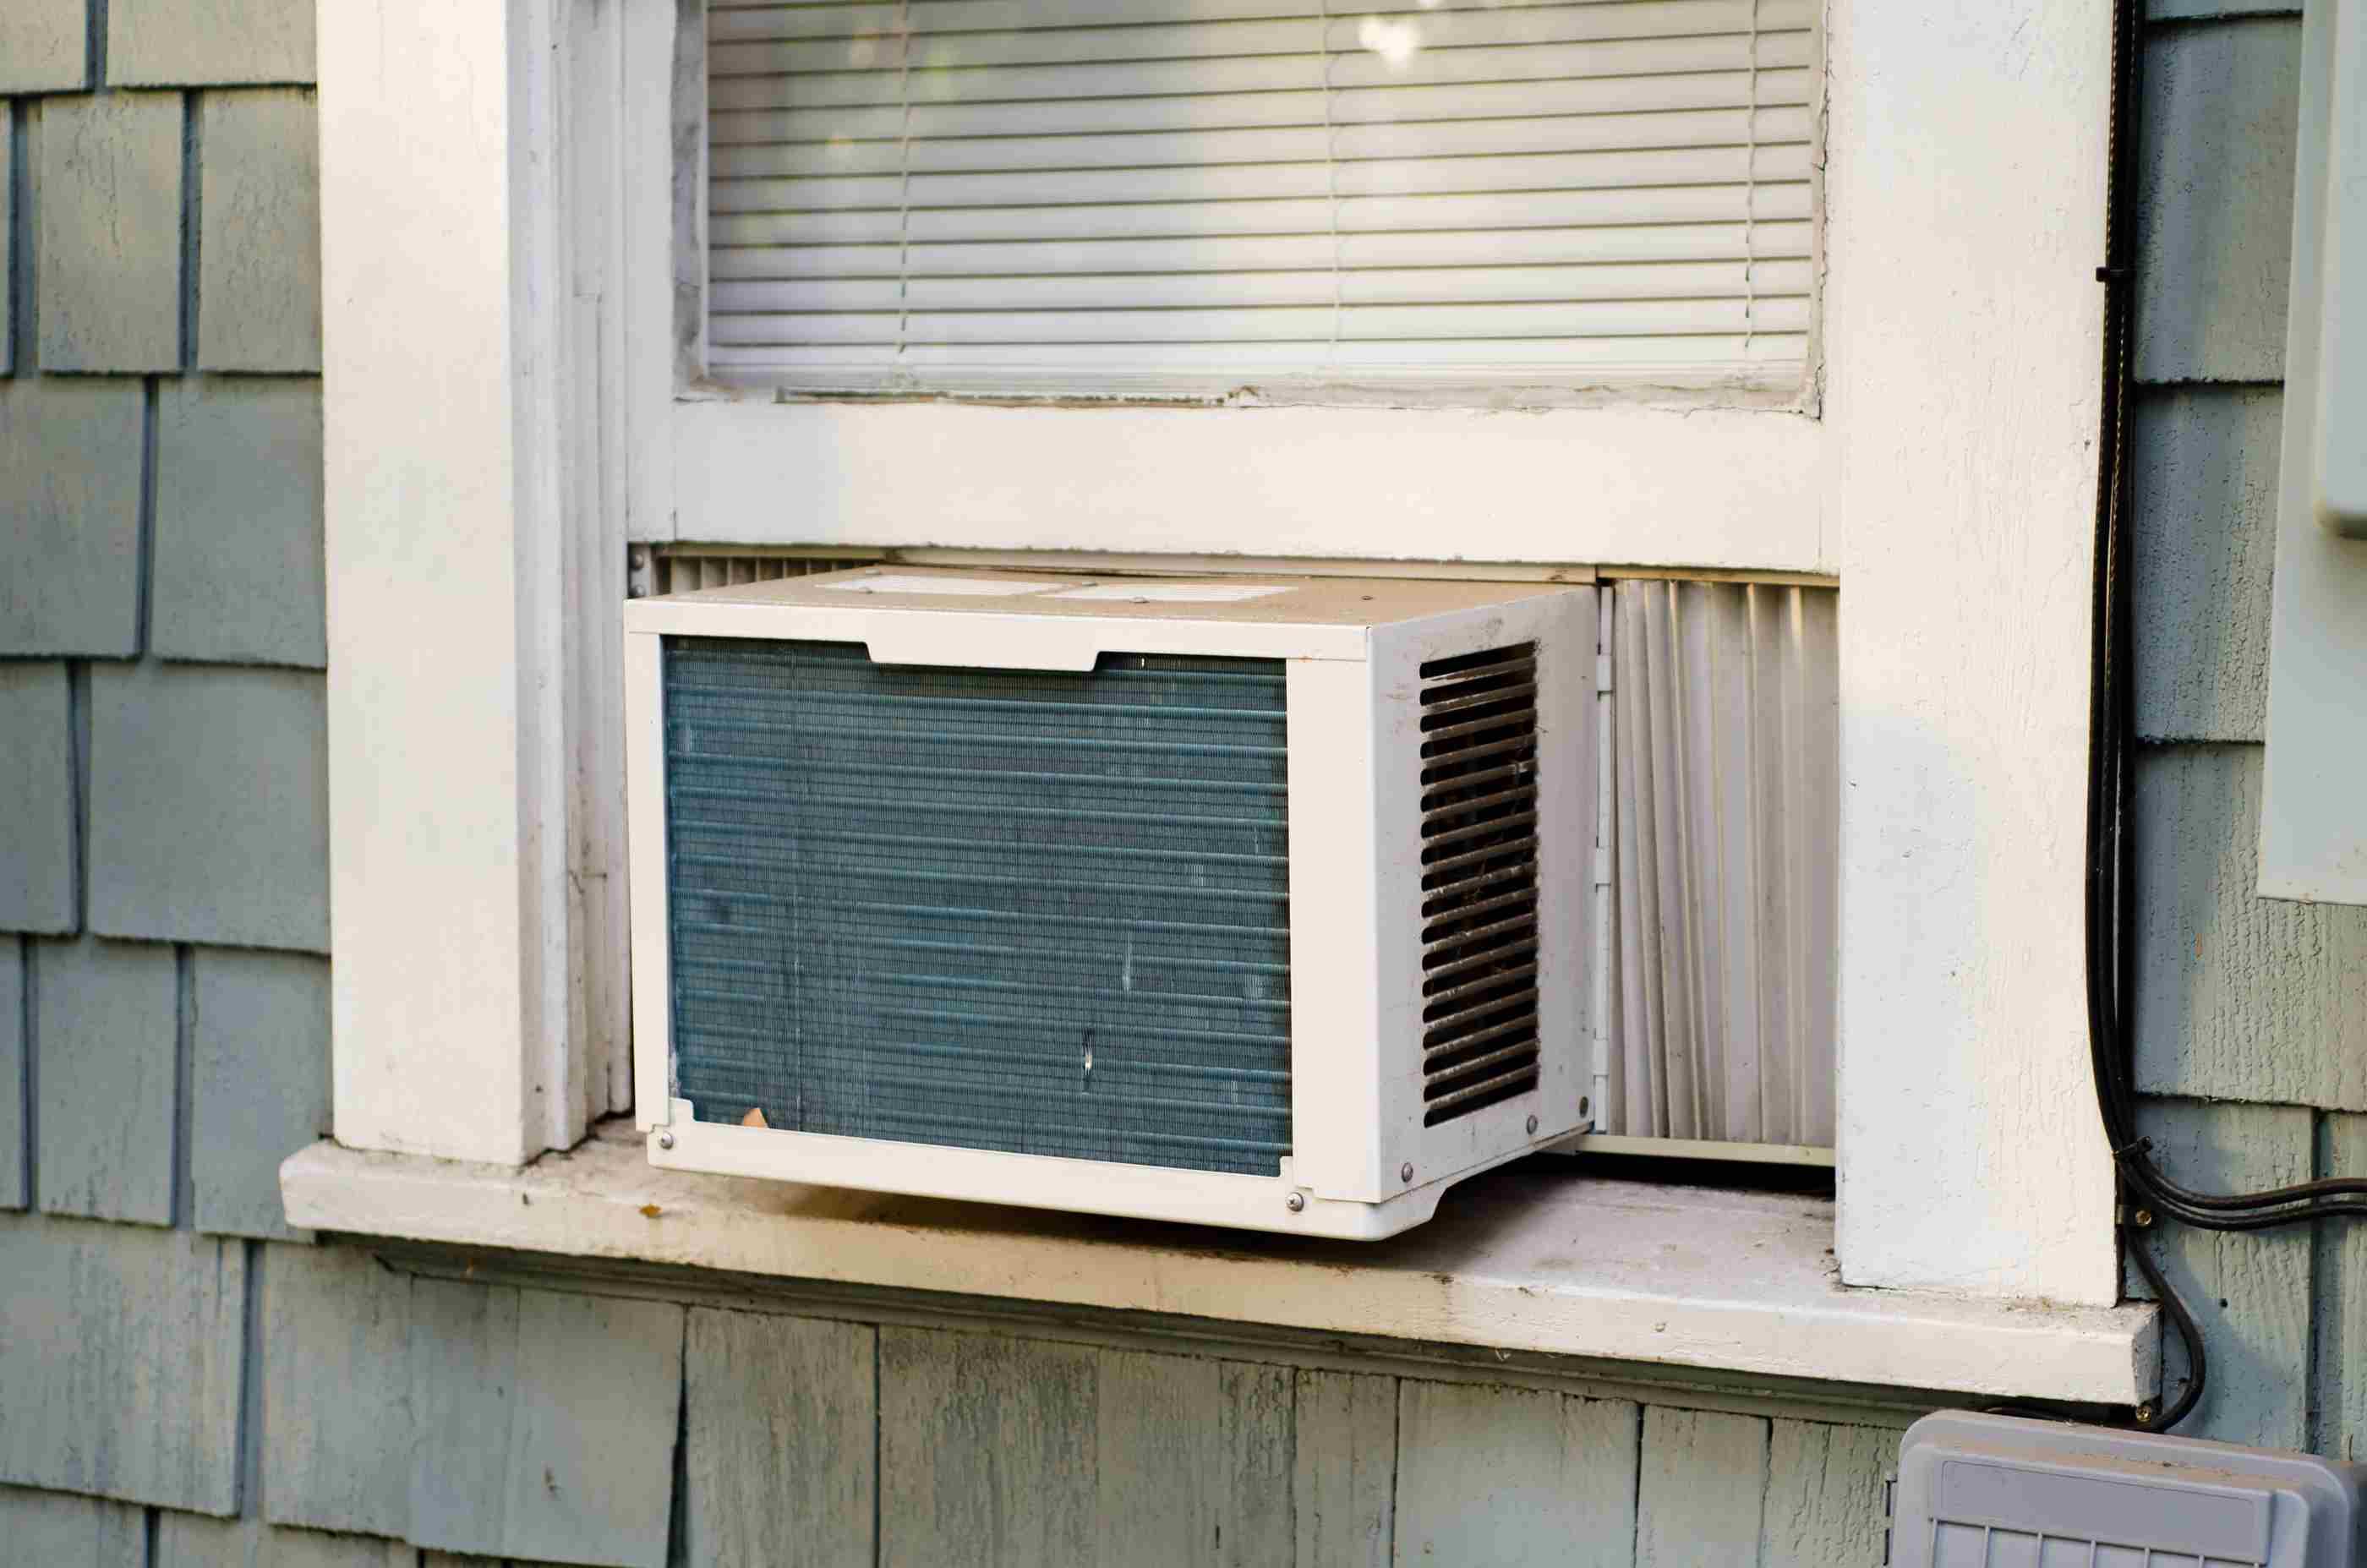 ge ac window unit drain plug